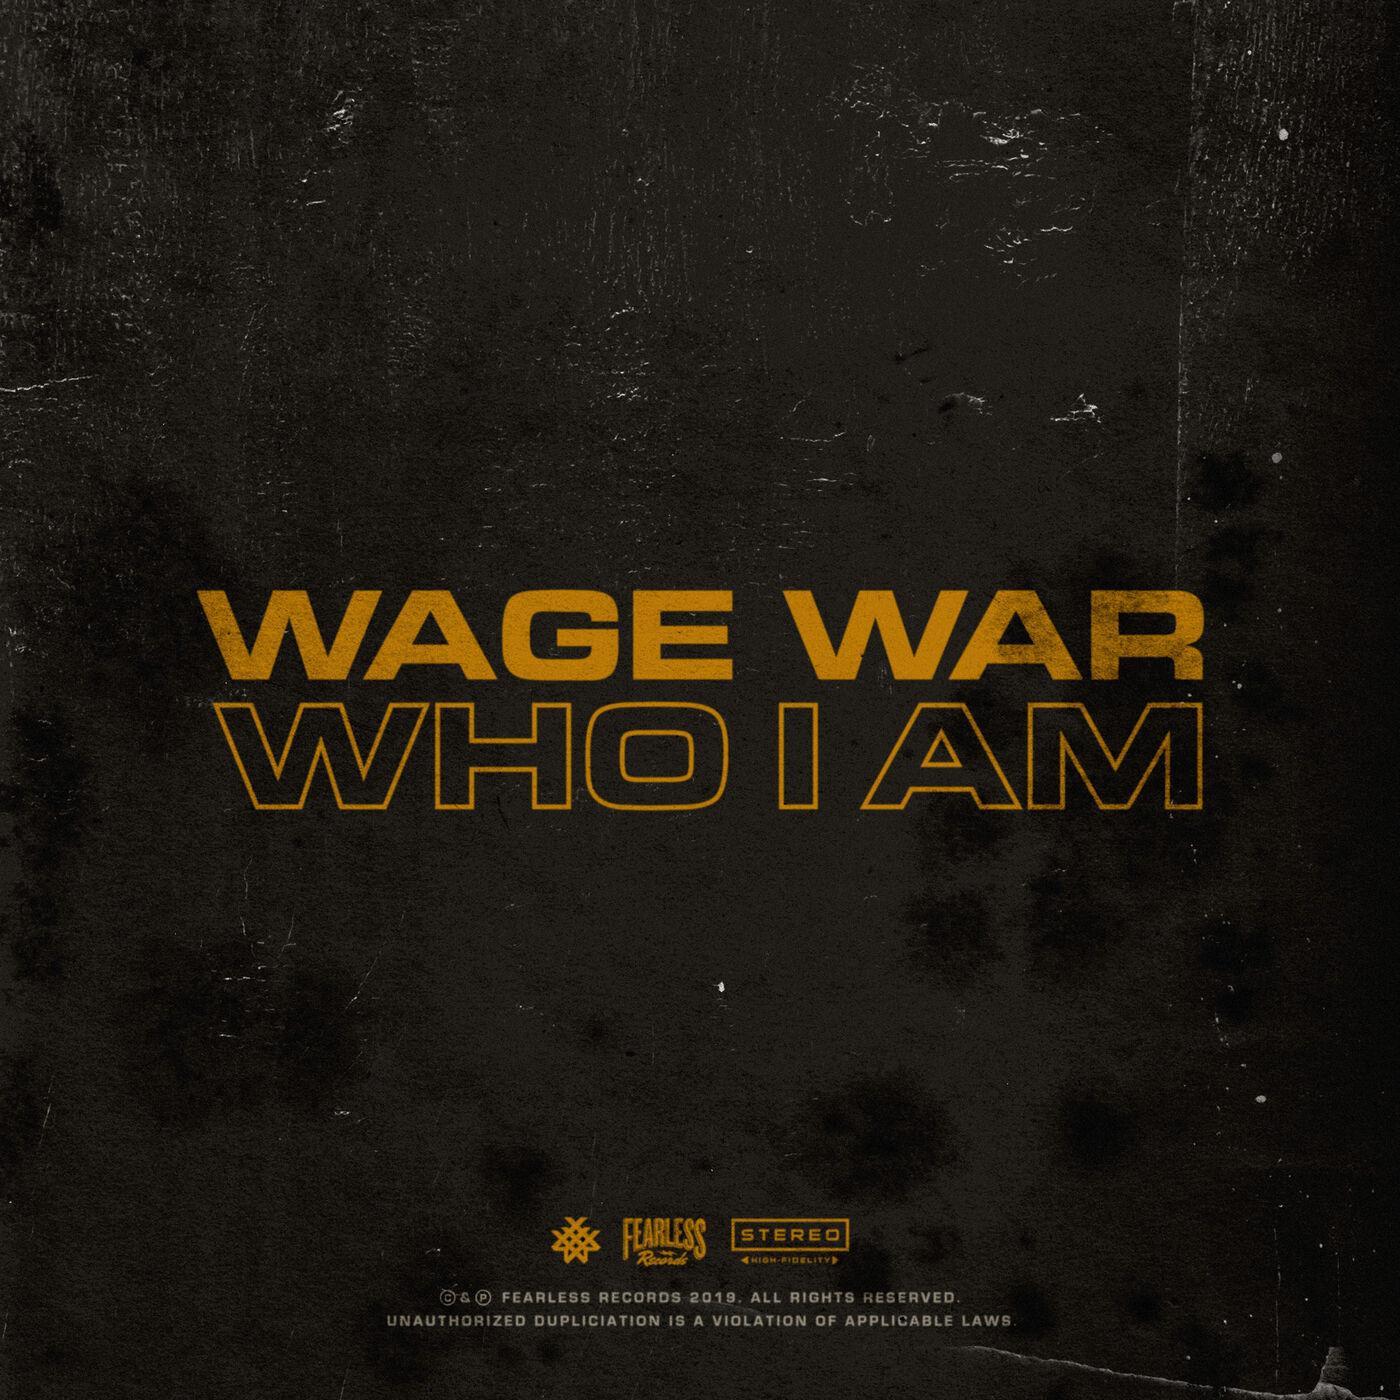 Wage War - Who I Am [single] (2019)